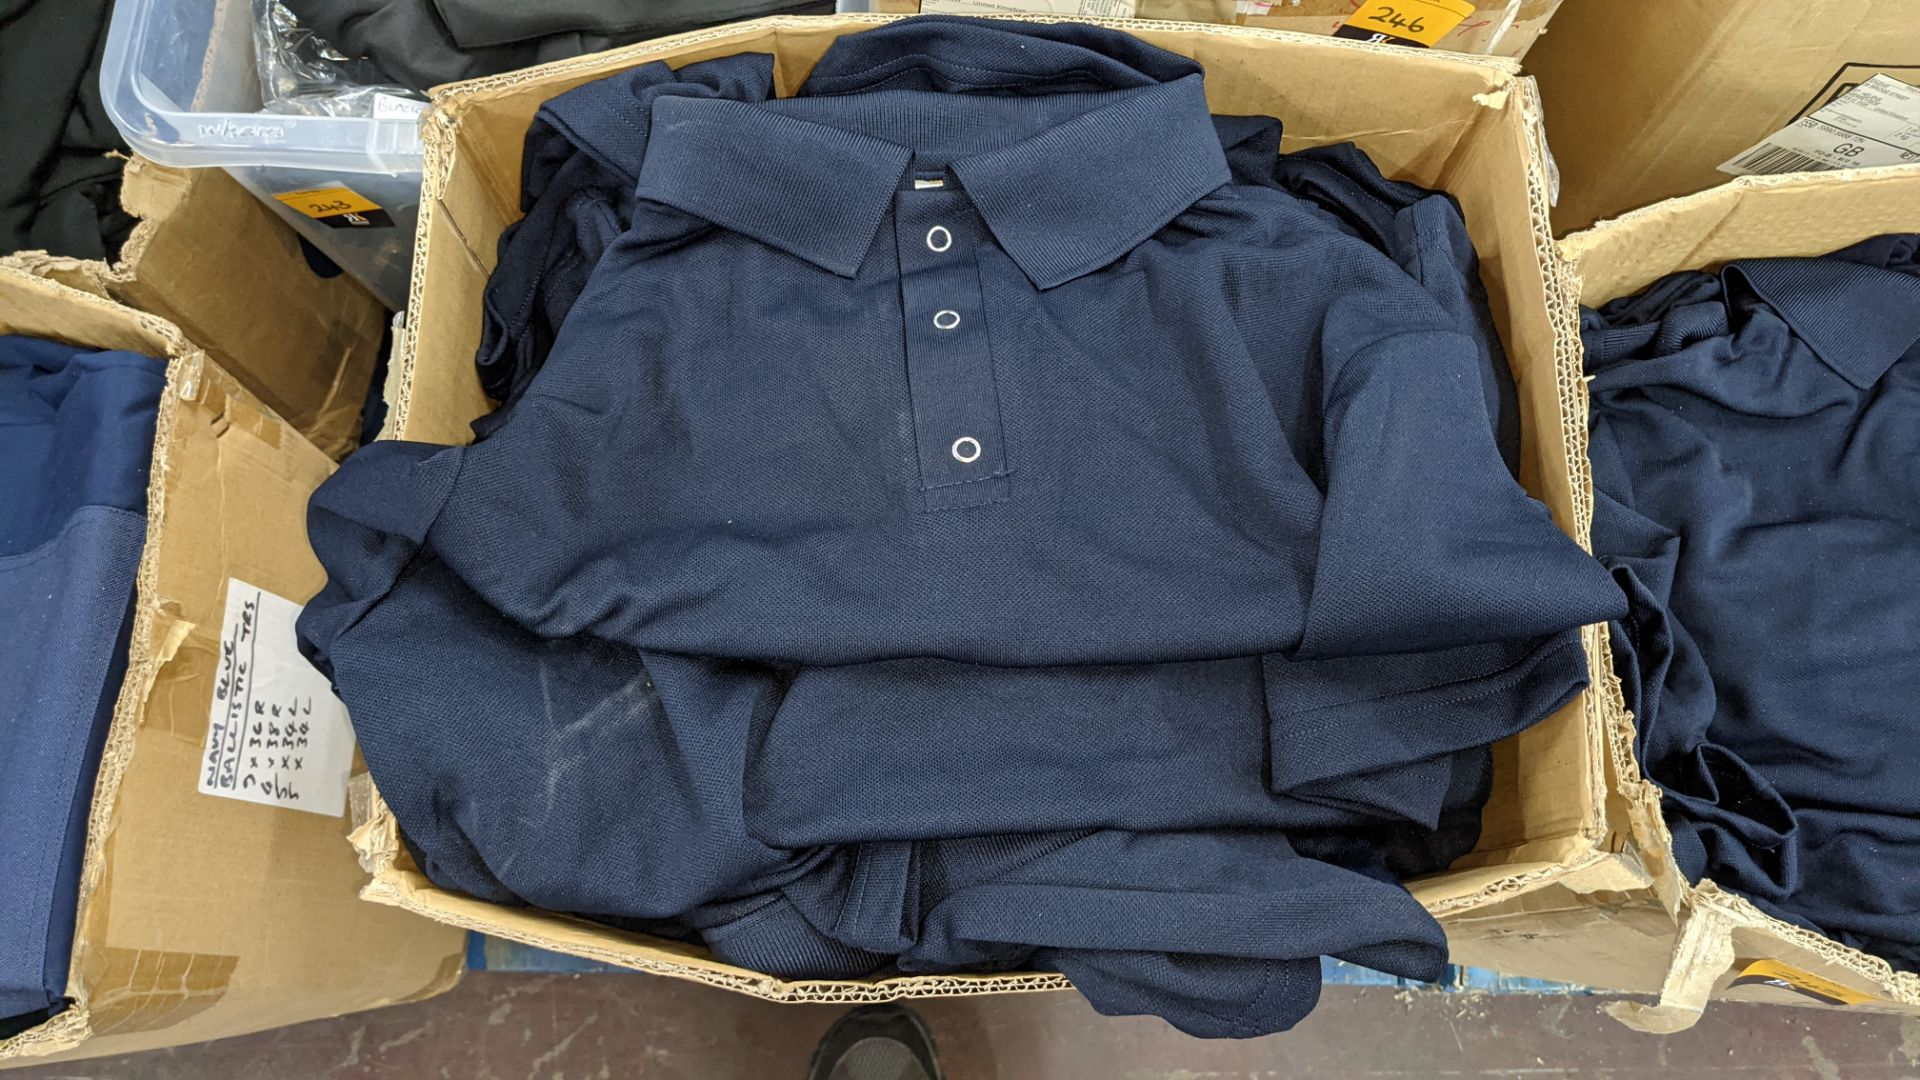 Large quantity of blue polo shirts - 1 box - Image 3 of 4